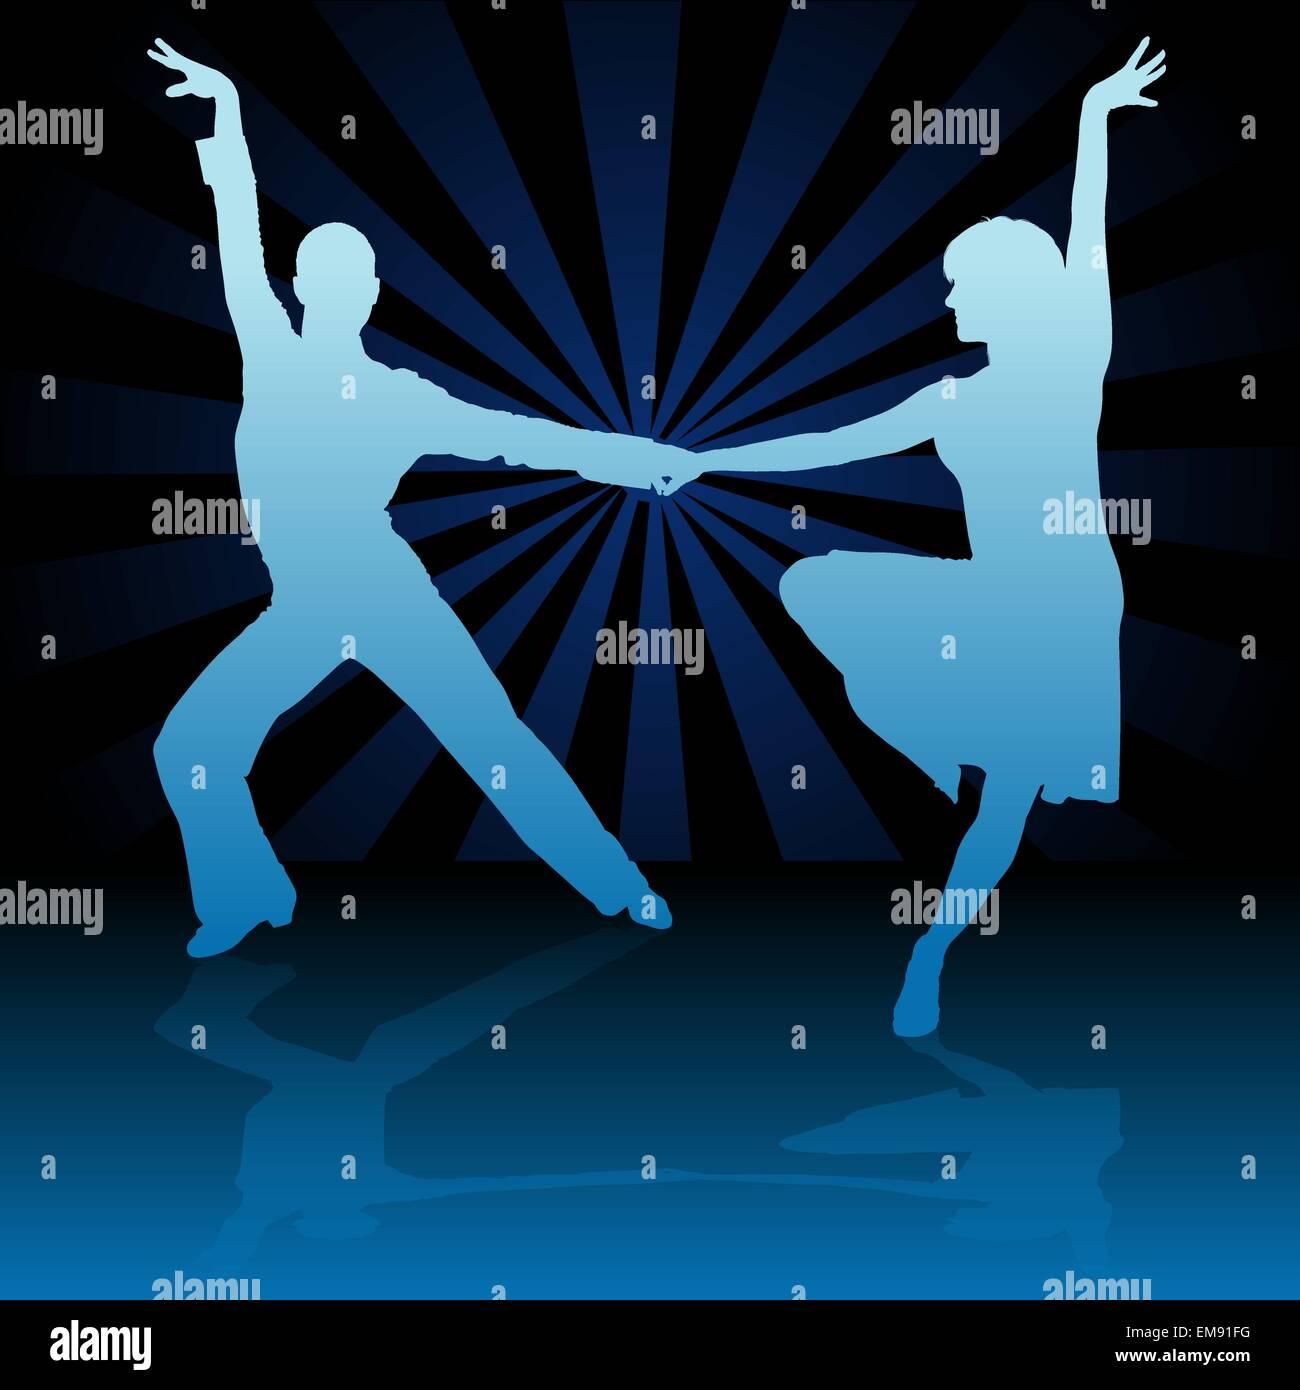 Latino American Dance - Stock Image